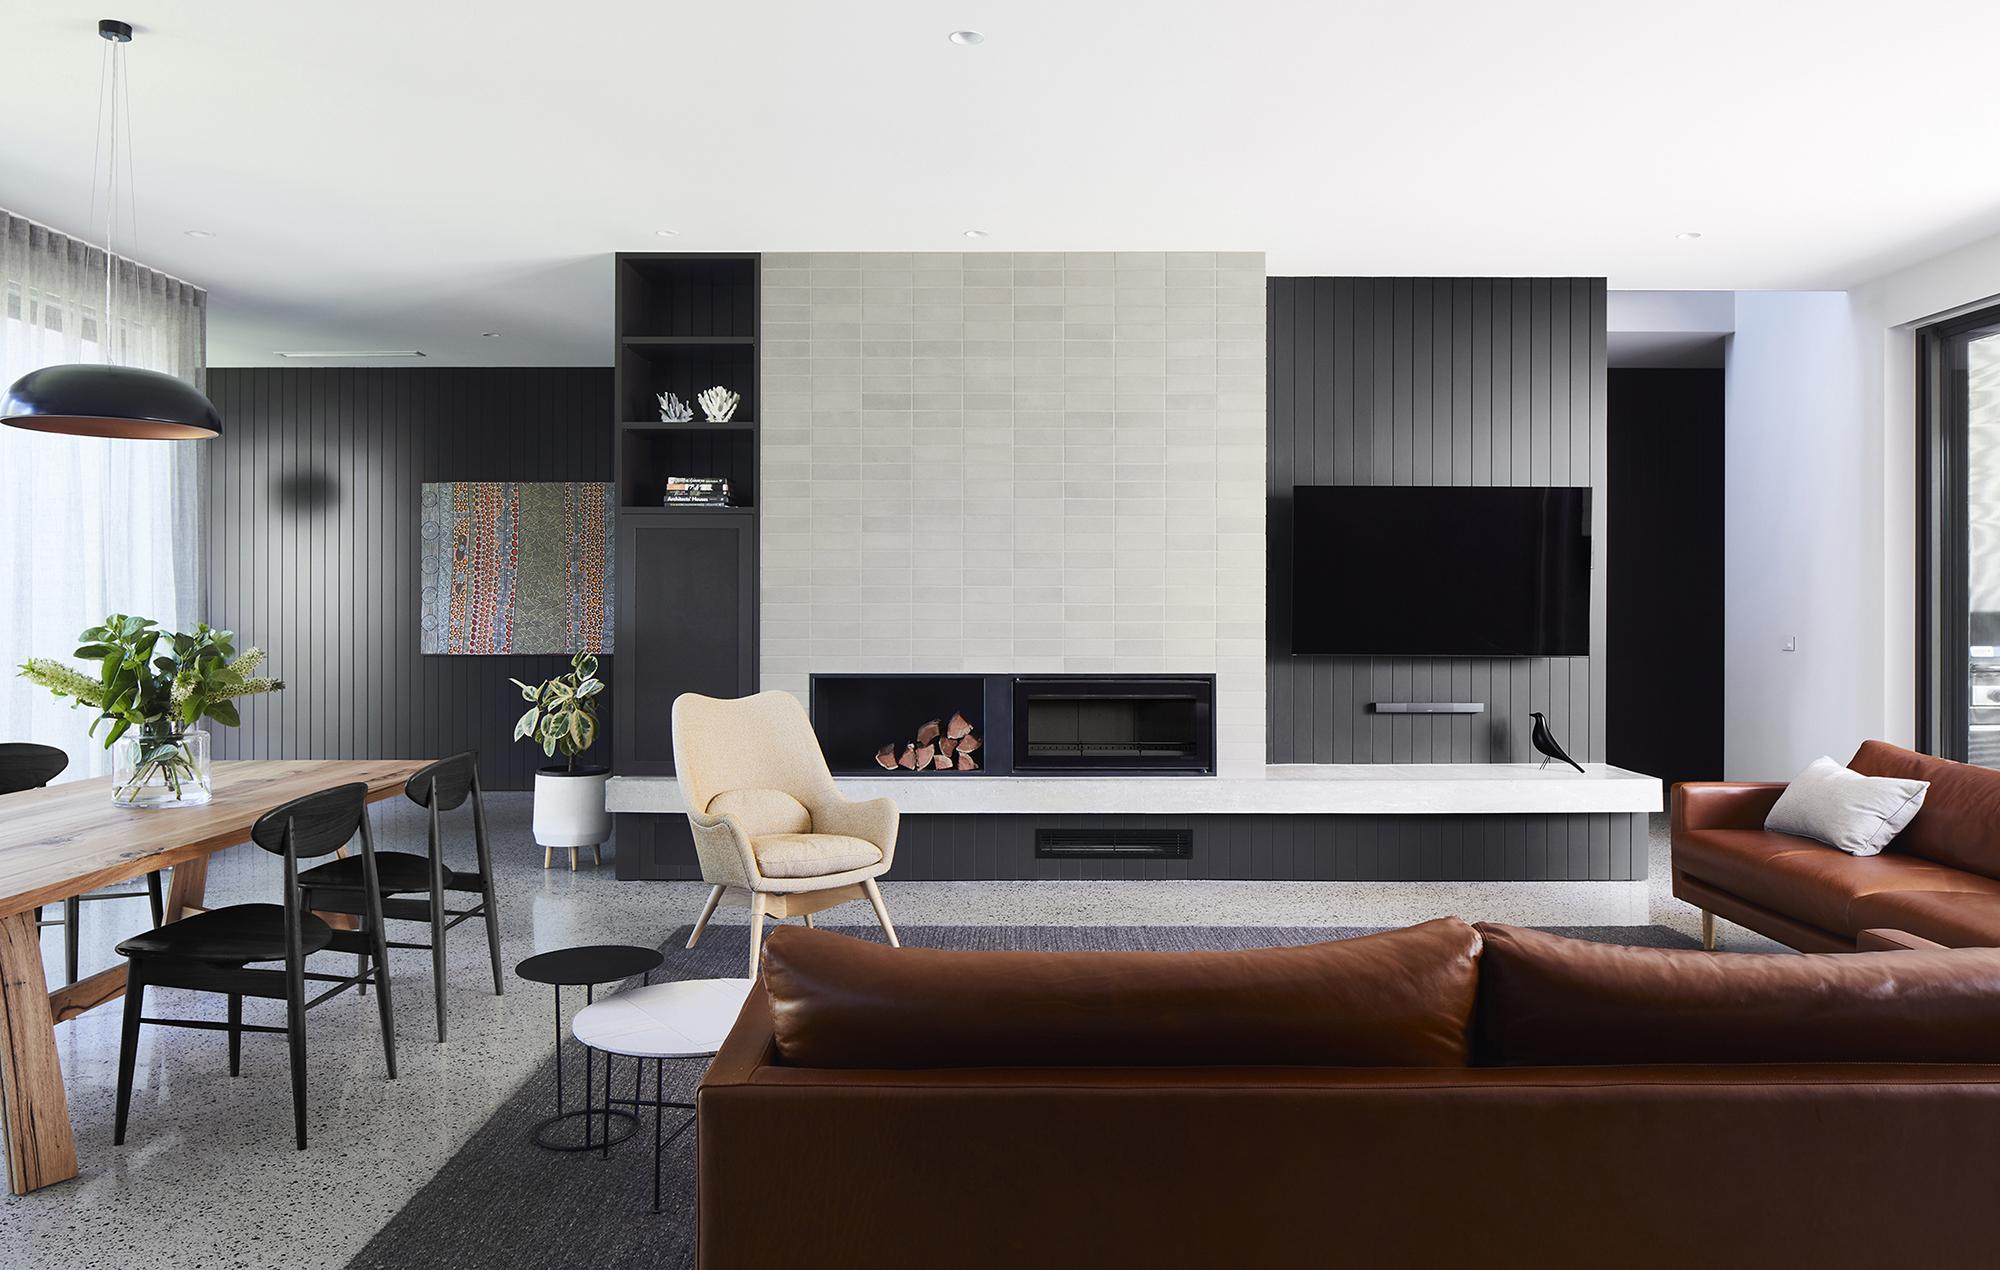 Project Title: Reid House by Austin Design Associates Image Credits: Armelle Habib